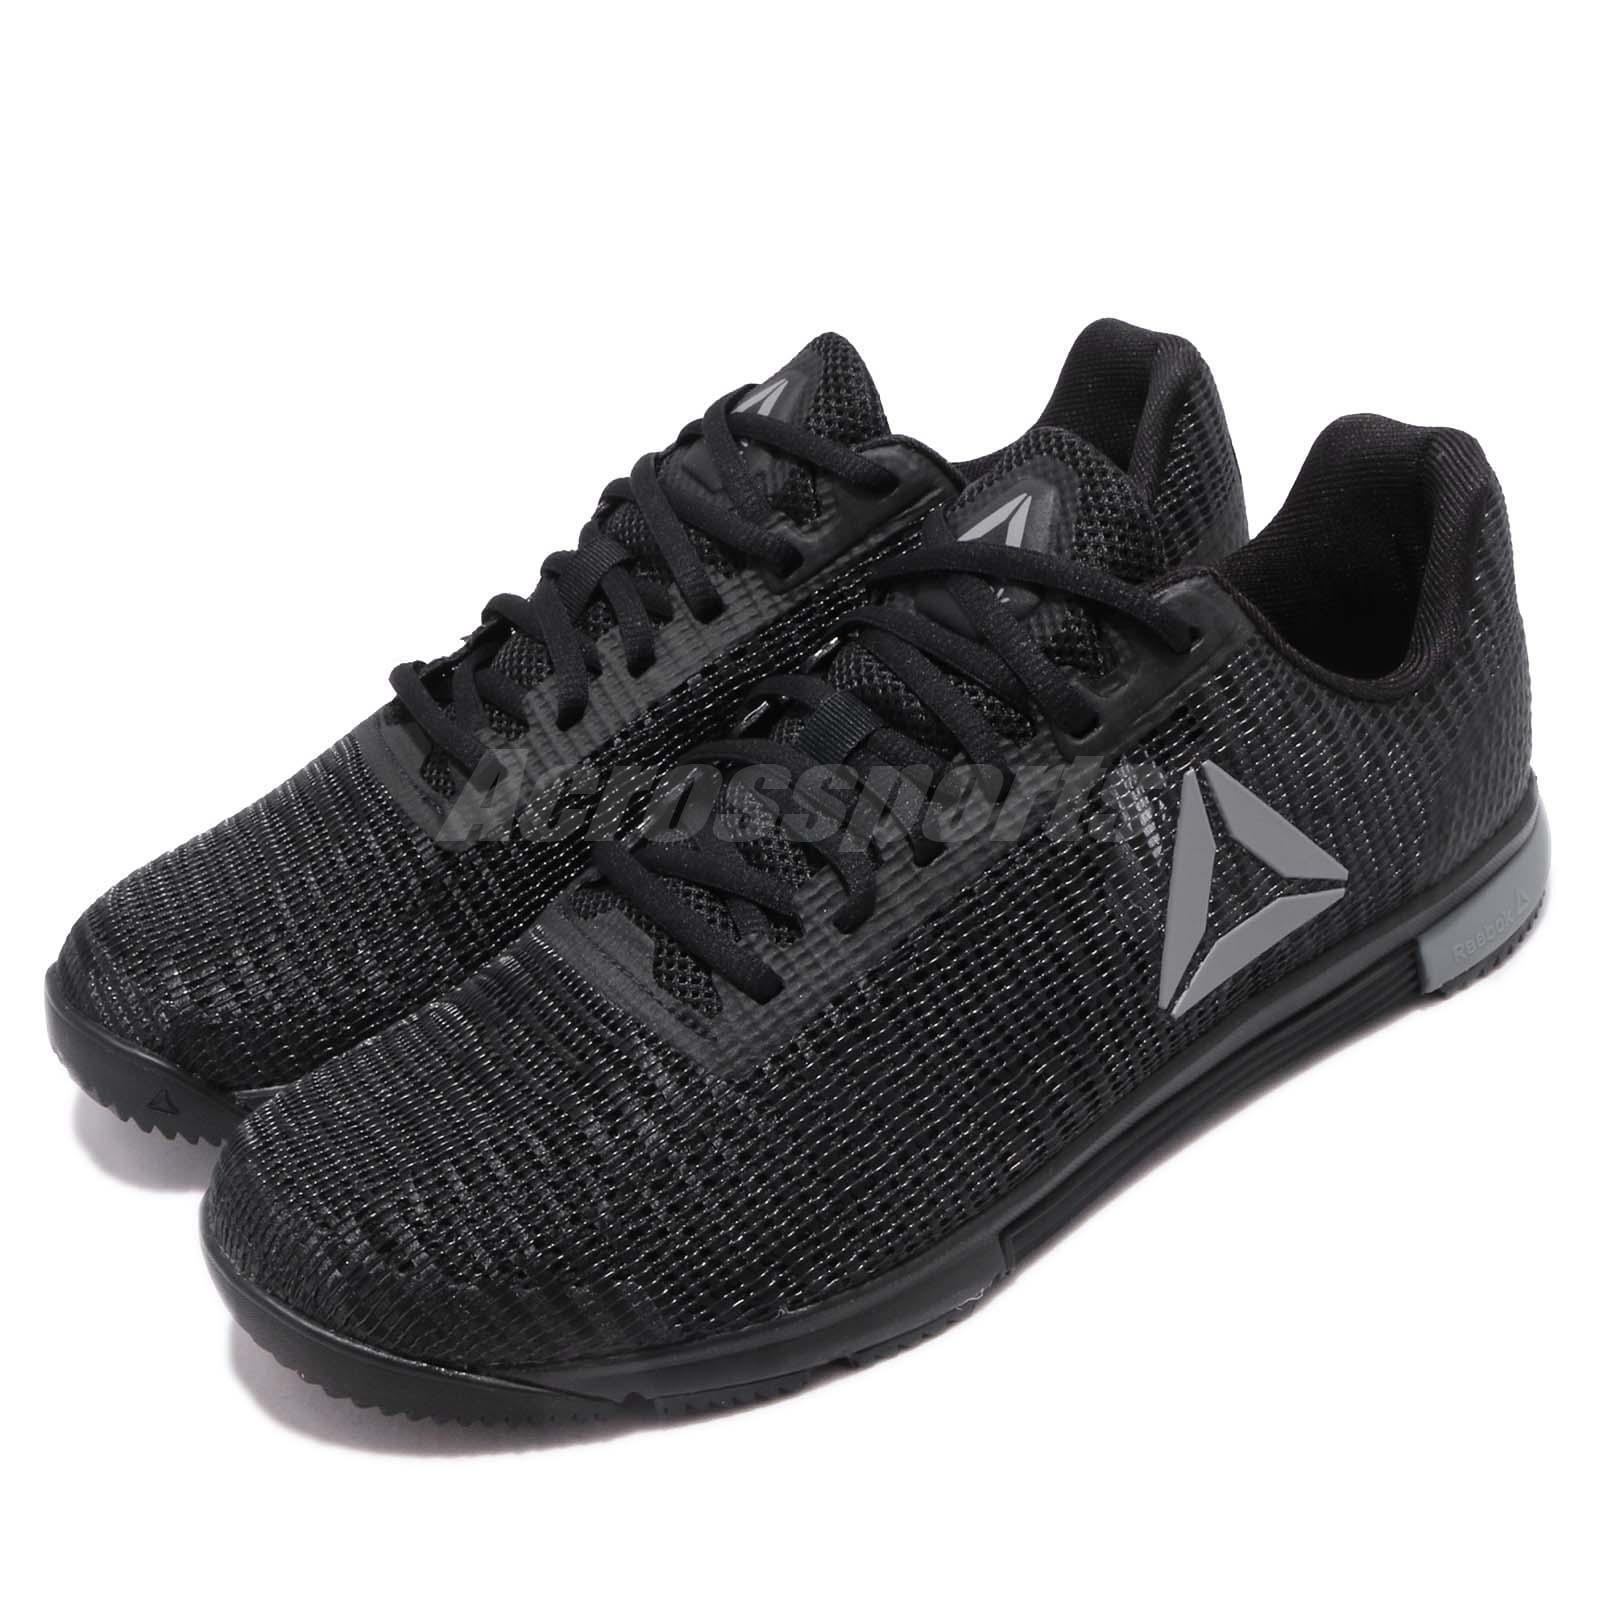 Reebok Speed TR Flexweave negro gris Men Cross Training zapatos zapatillas DV4403